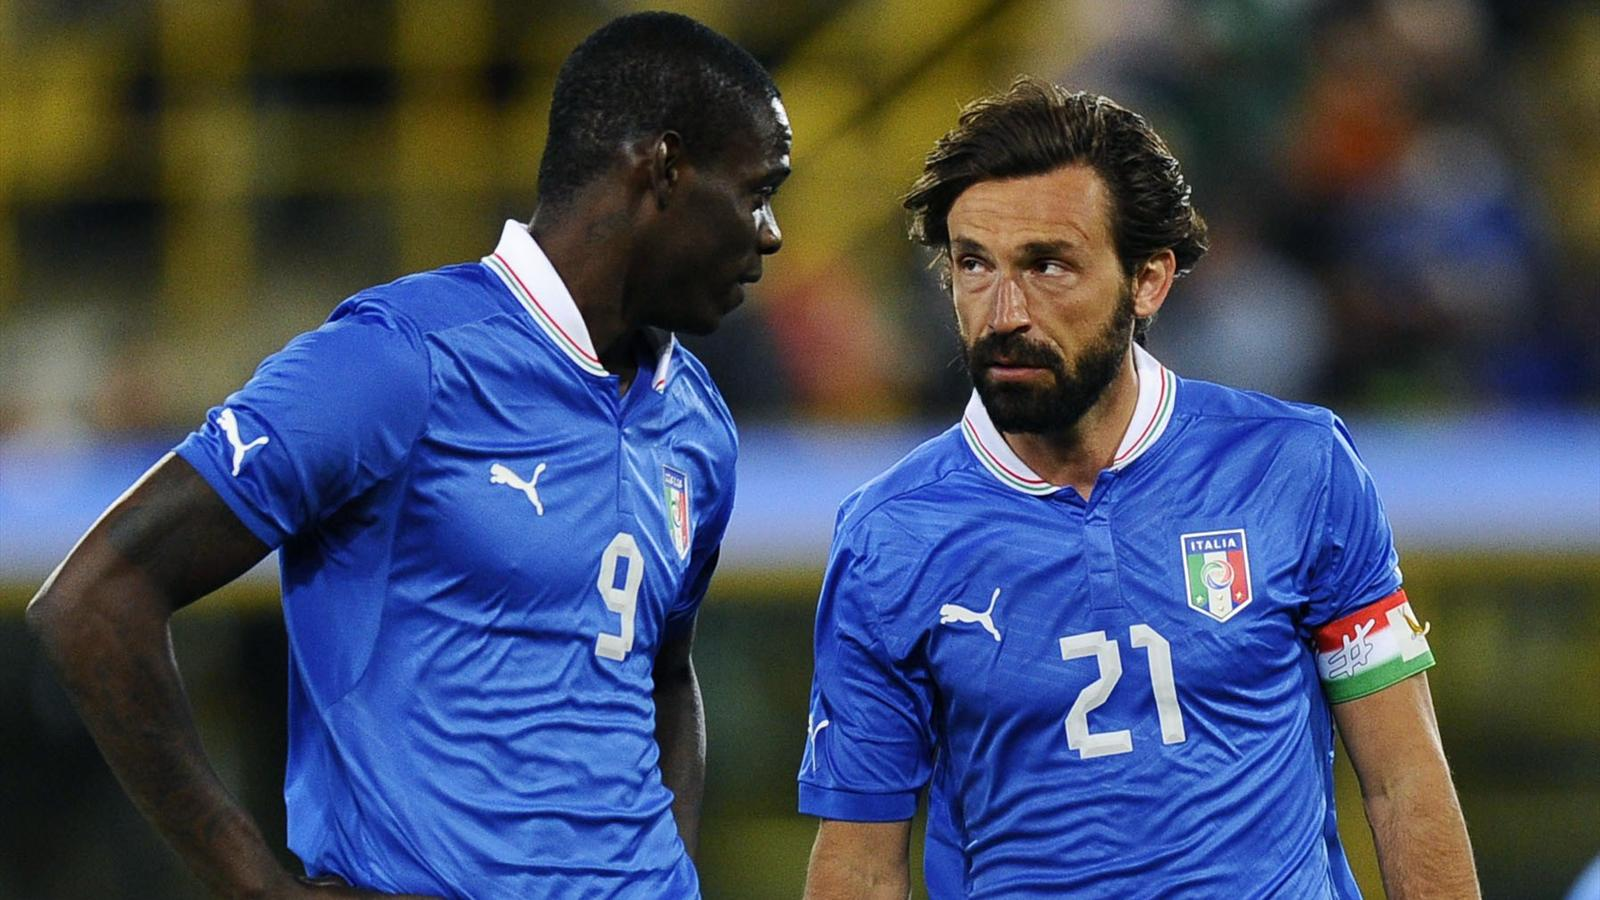 Match Italie Vs Costa-Rica en direct sur beIN Sport 1 et live streaming à partir de 18h